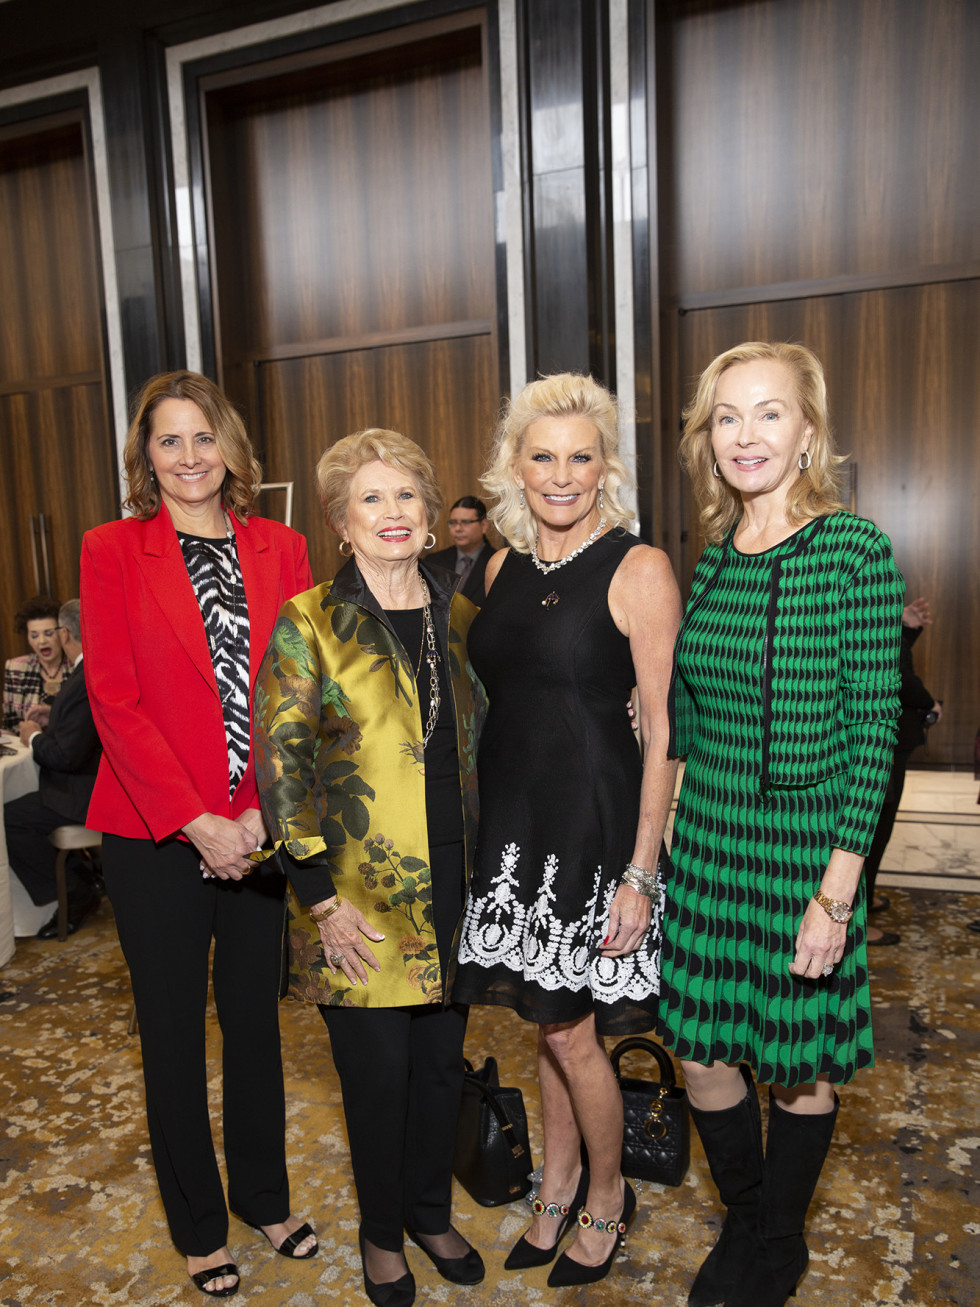 Barbara Bush Power of Literacy Luncheon Julie Andrews 2019 Laurel D'Antoni, Ginger Blanton, Kristen Oesch Stubbs, and Alice Mosing